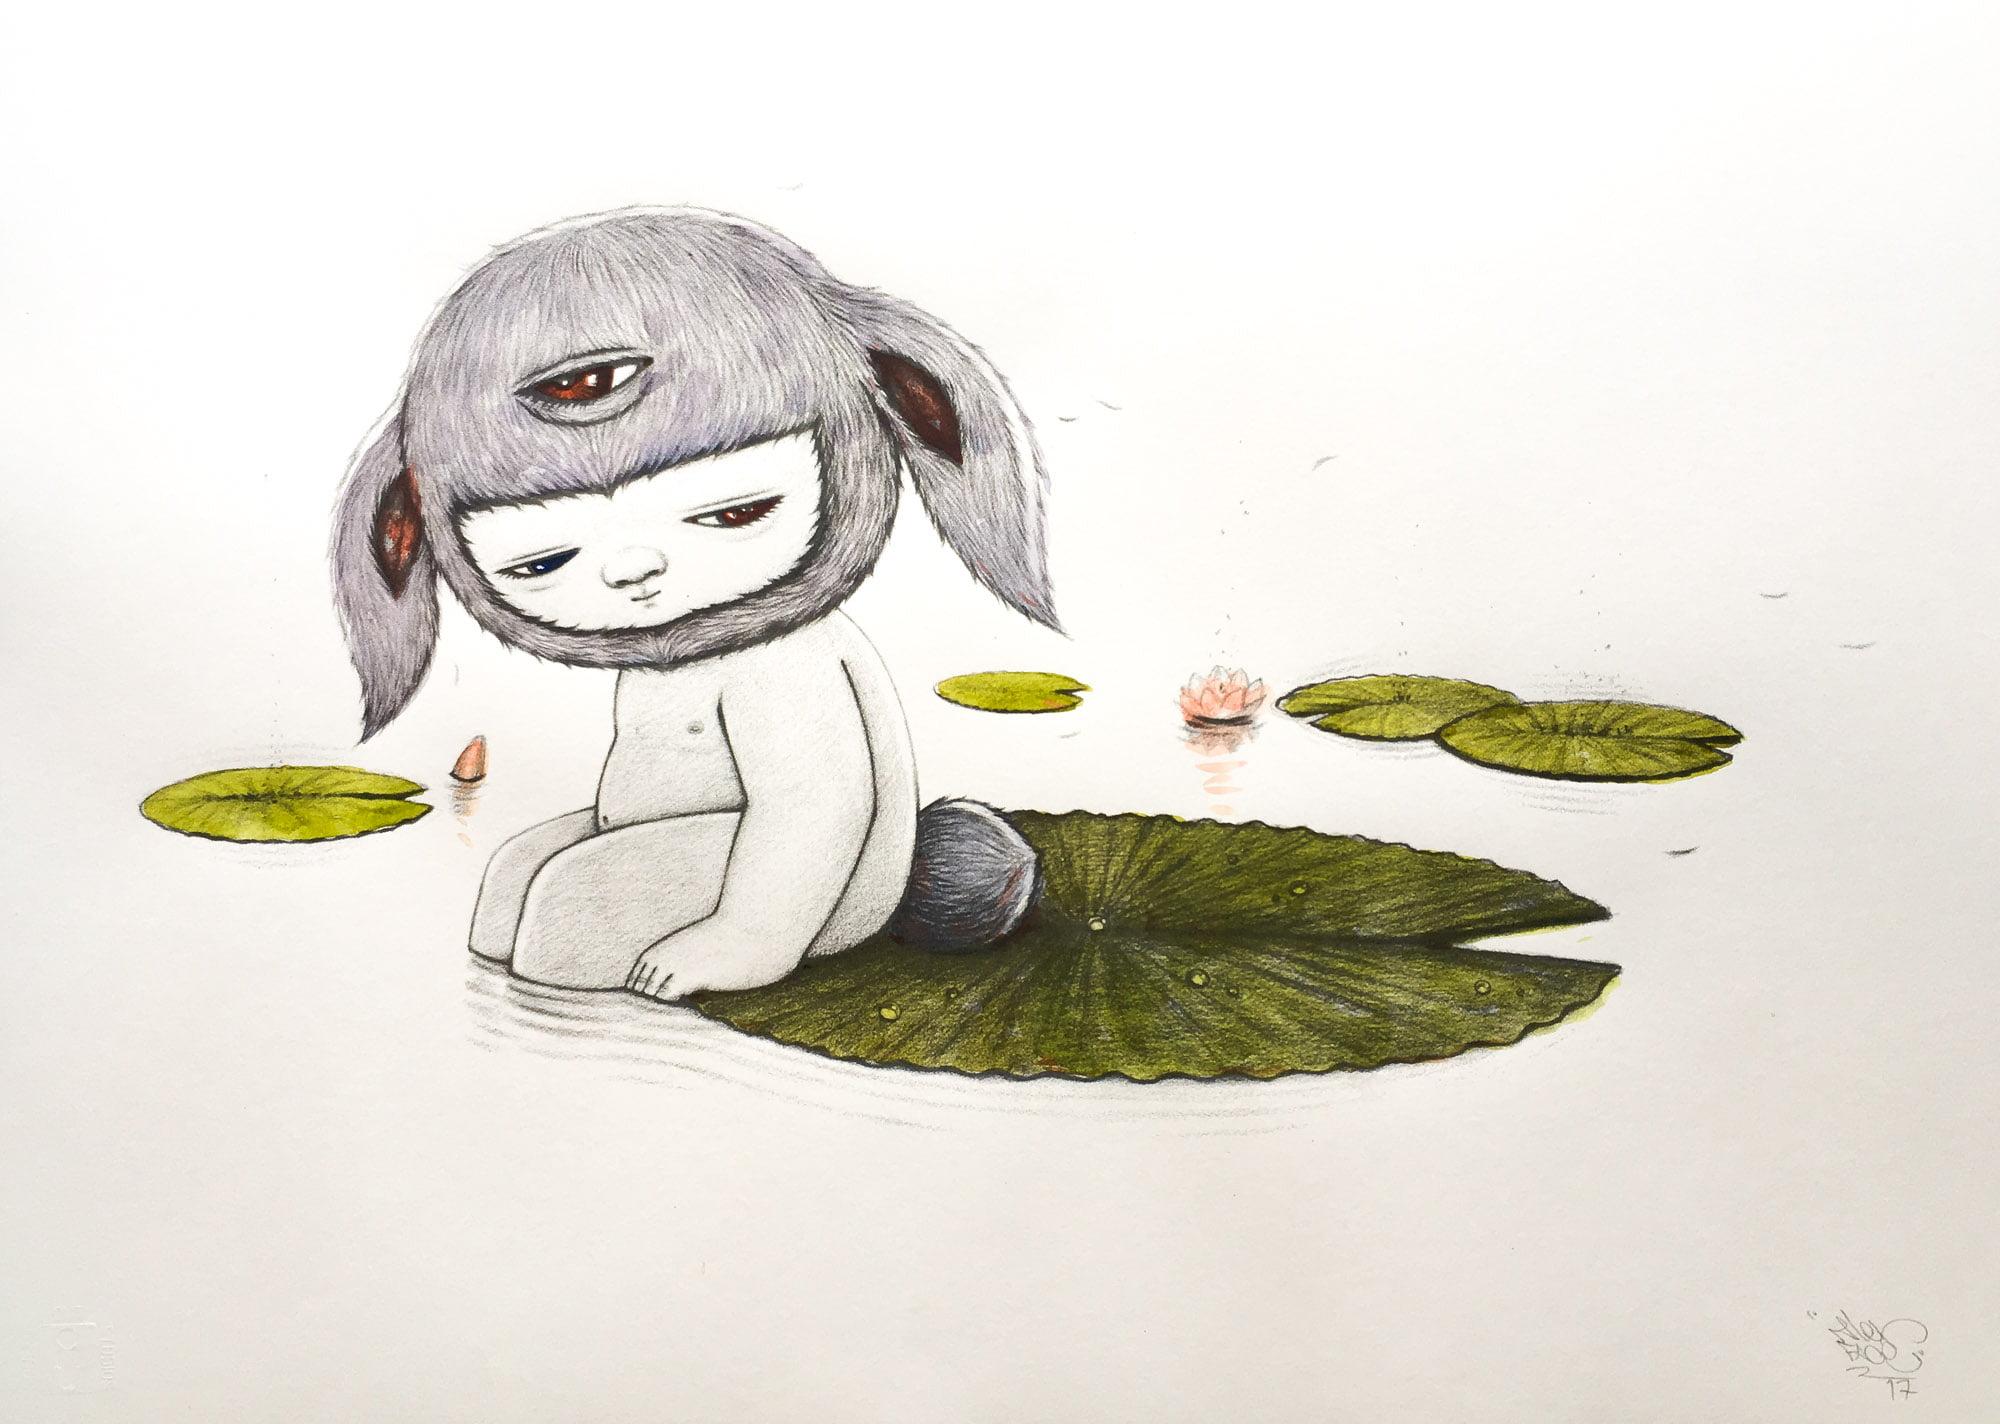 alexface watercolors